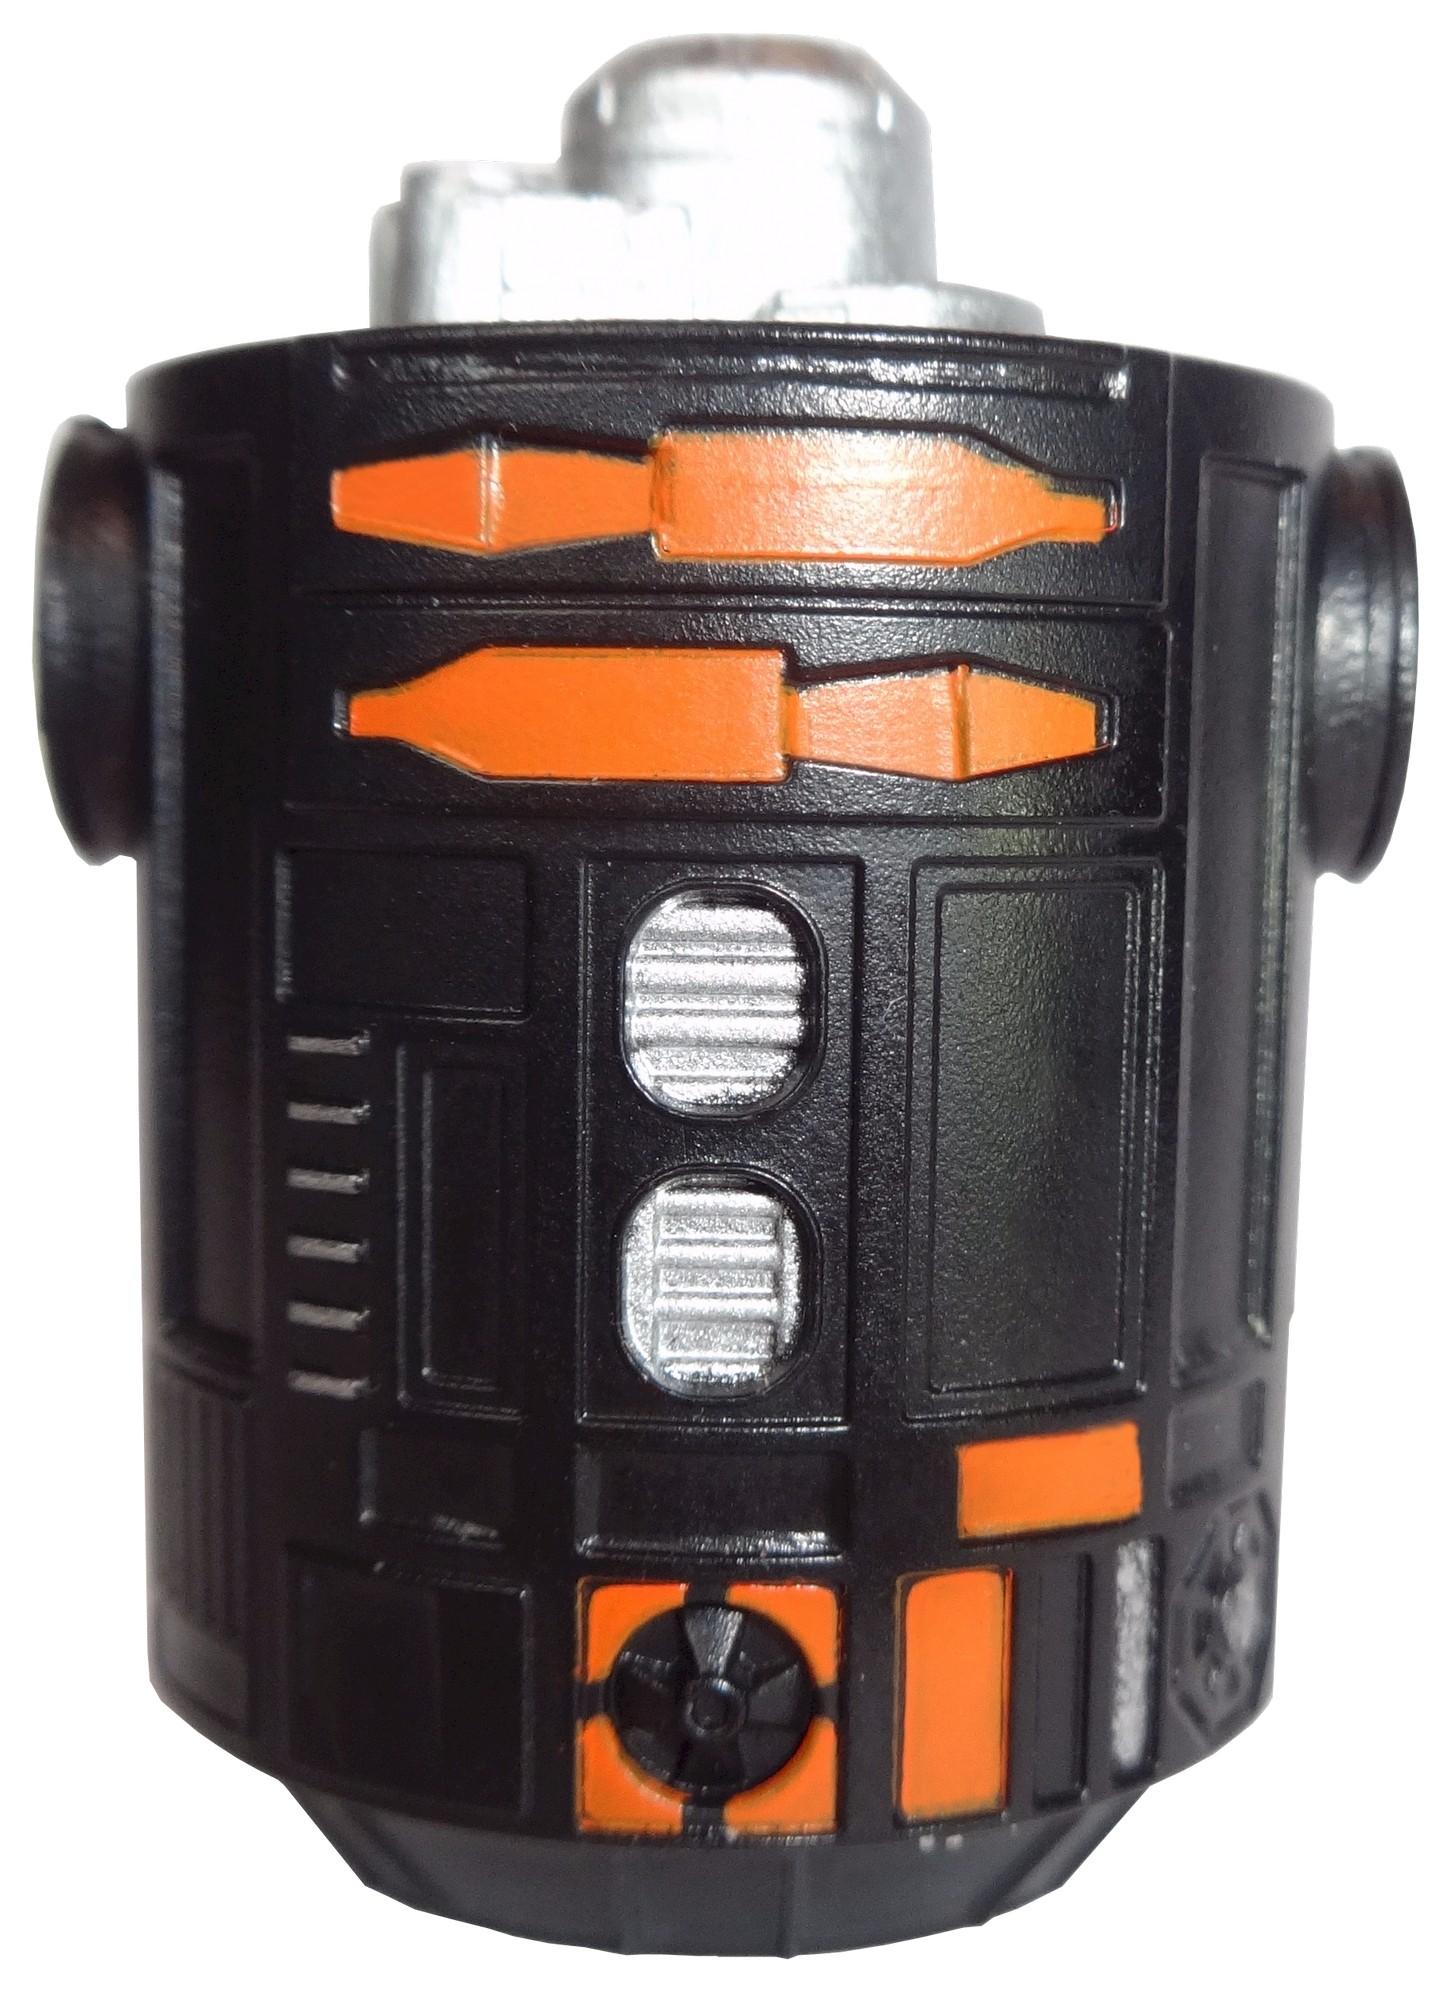 Black & Orange Astromech Droid Body ~ Series 2 from Disney Star Wars Build-A-Droid Factory © Dizdude.com